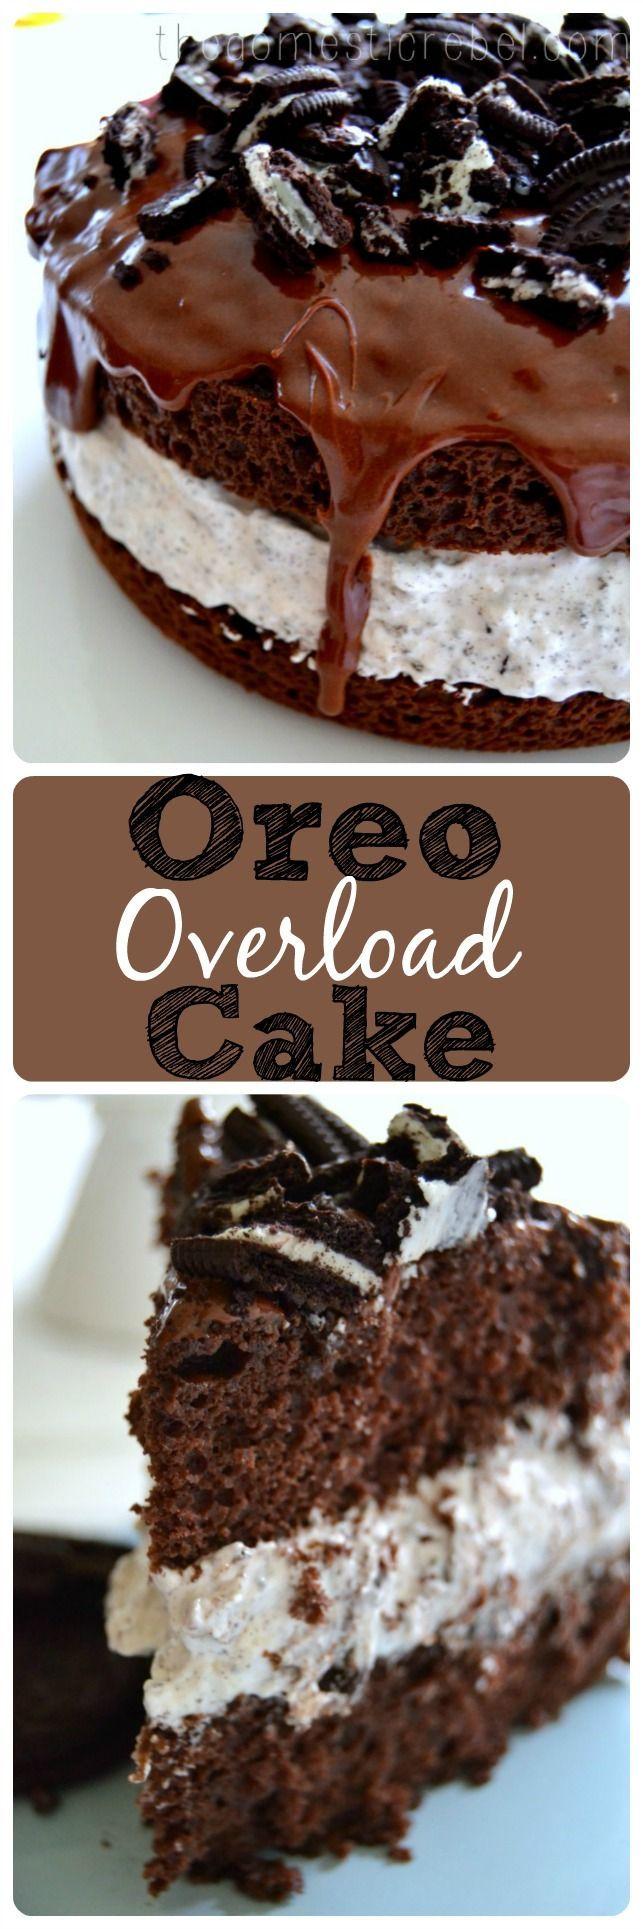 Oreo Overload Cake is for serious Oreo cookie lovers! #oreos #chocolate #cake